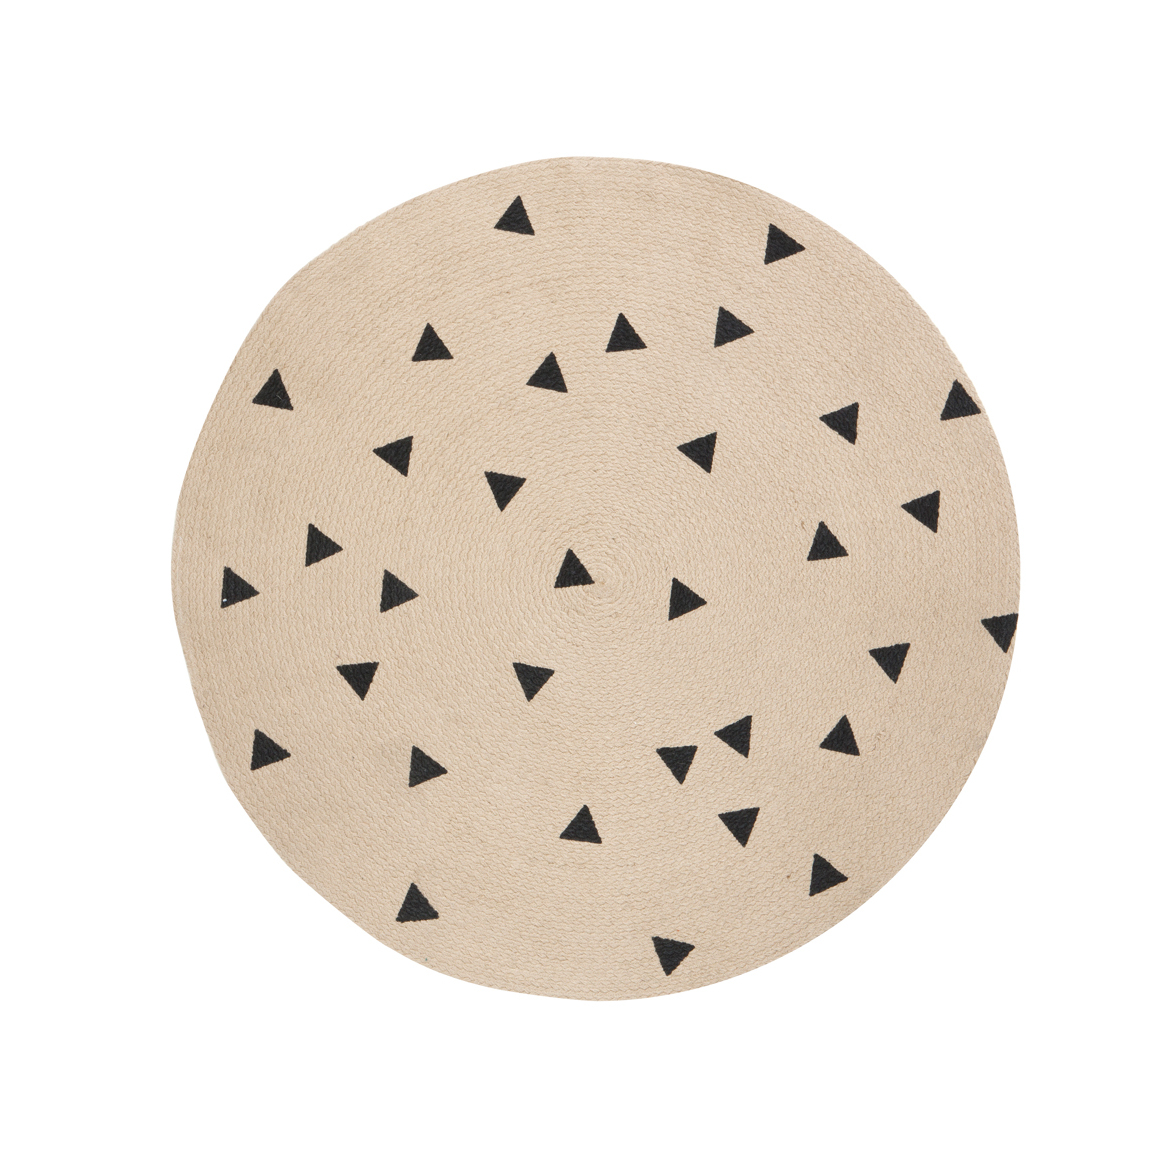 Leo bella ferm living round carpet rug triangle